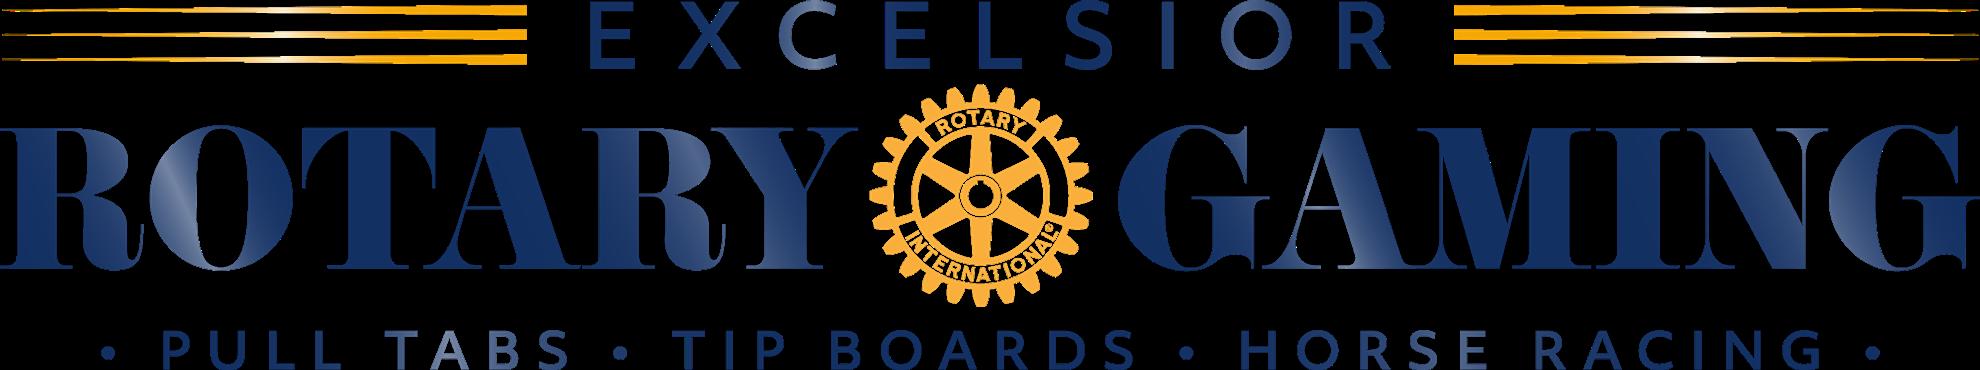 excelsior rotary club logo